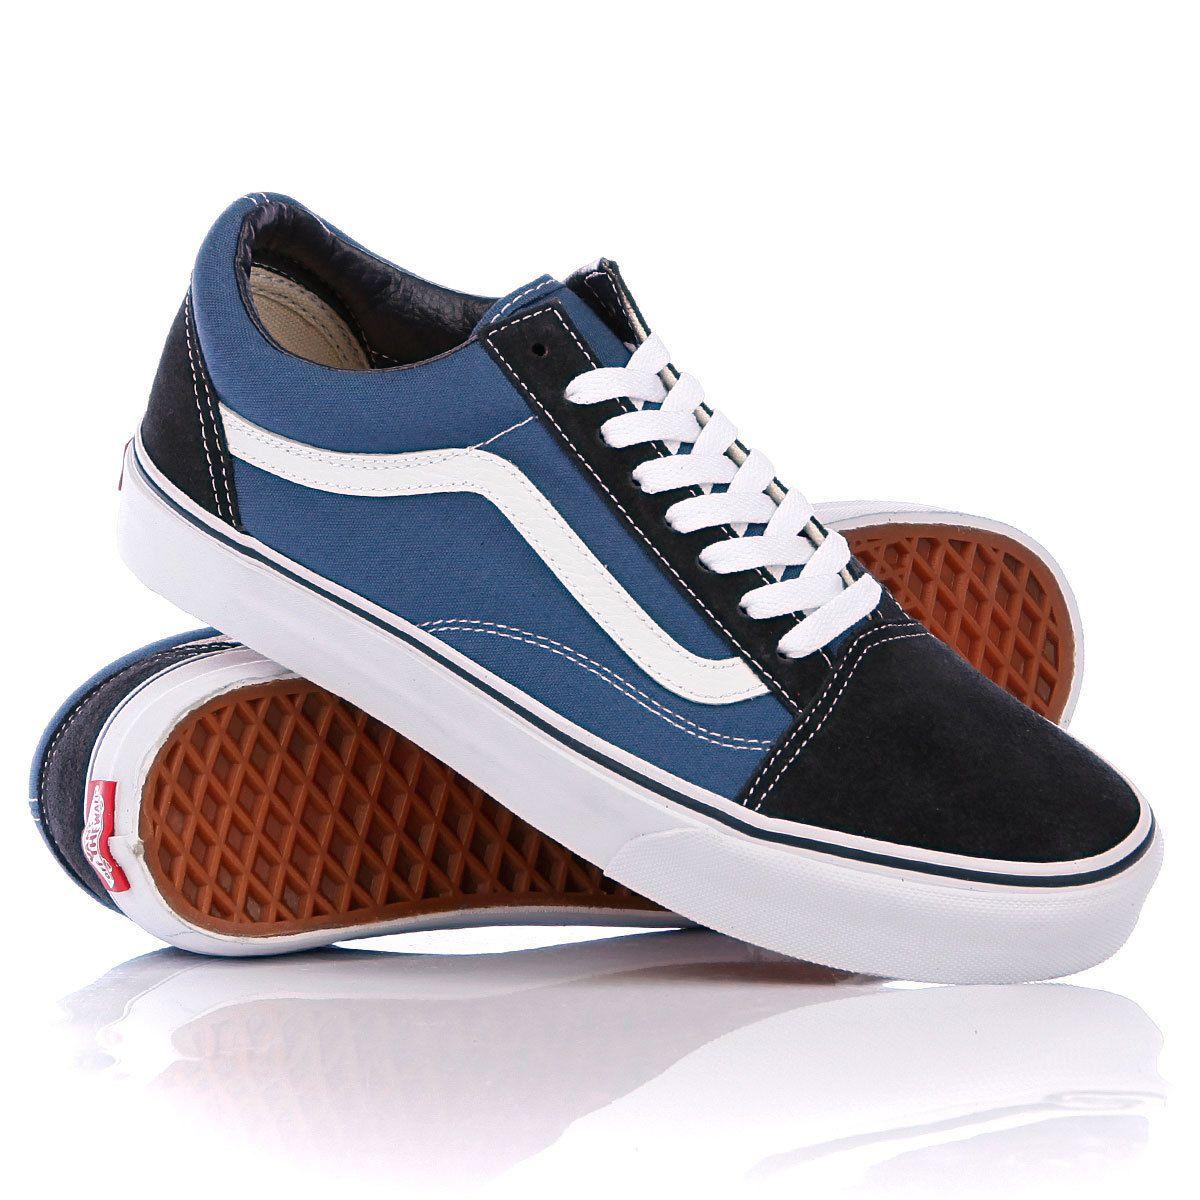 vans old skool lite navy stv navy white ultracush casual classic men 39 s 7 5 men 39 s shoes. Black Bedroom Furniture Sets. Home Design Ideas